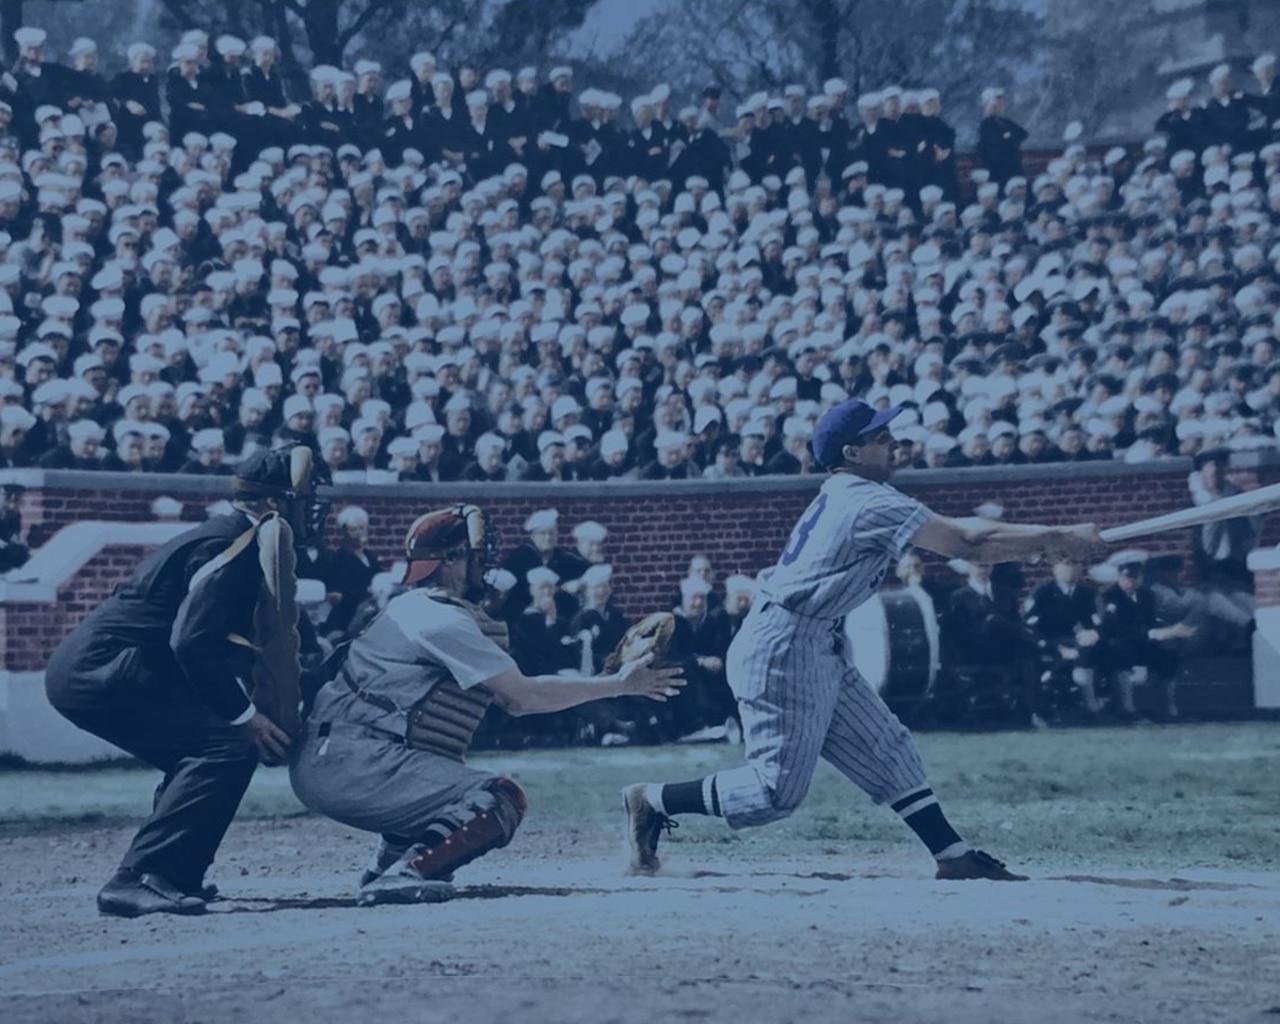 A batter, catcher and umpire play baseball at a stadium.